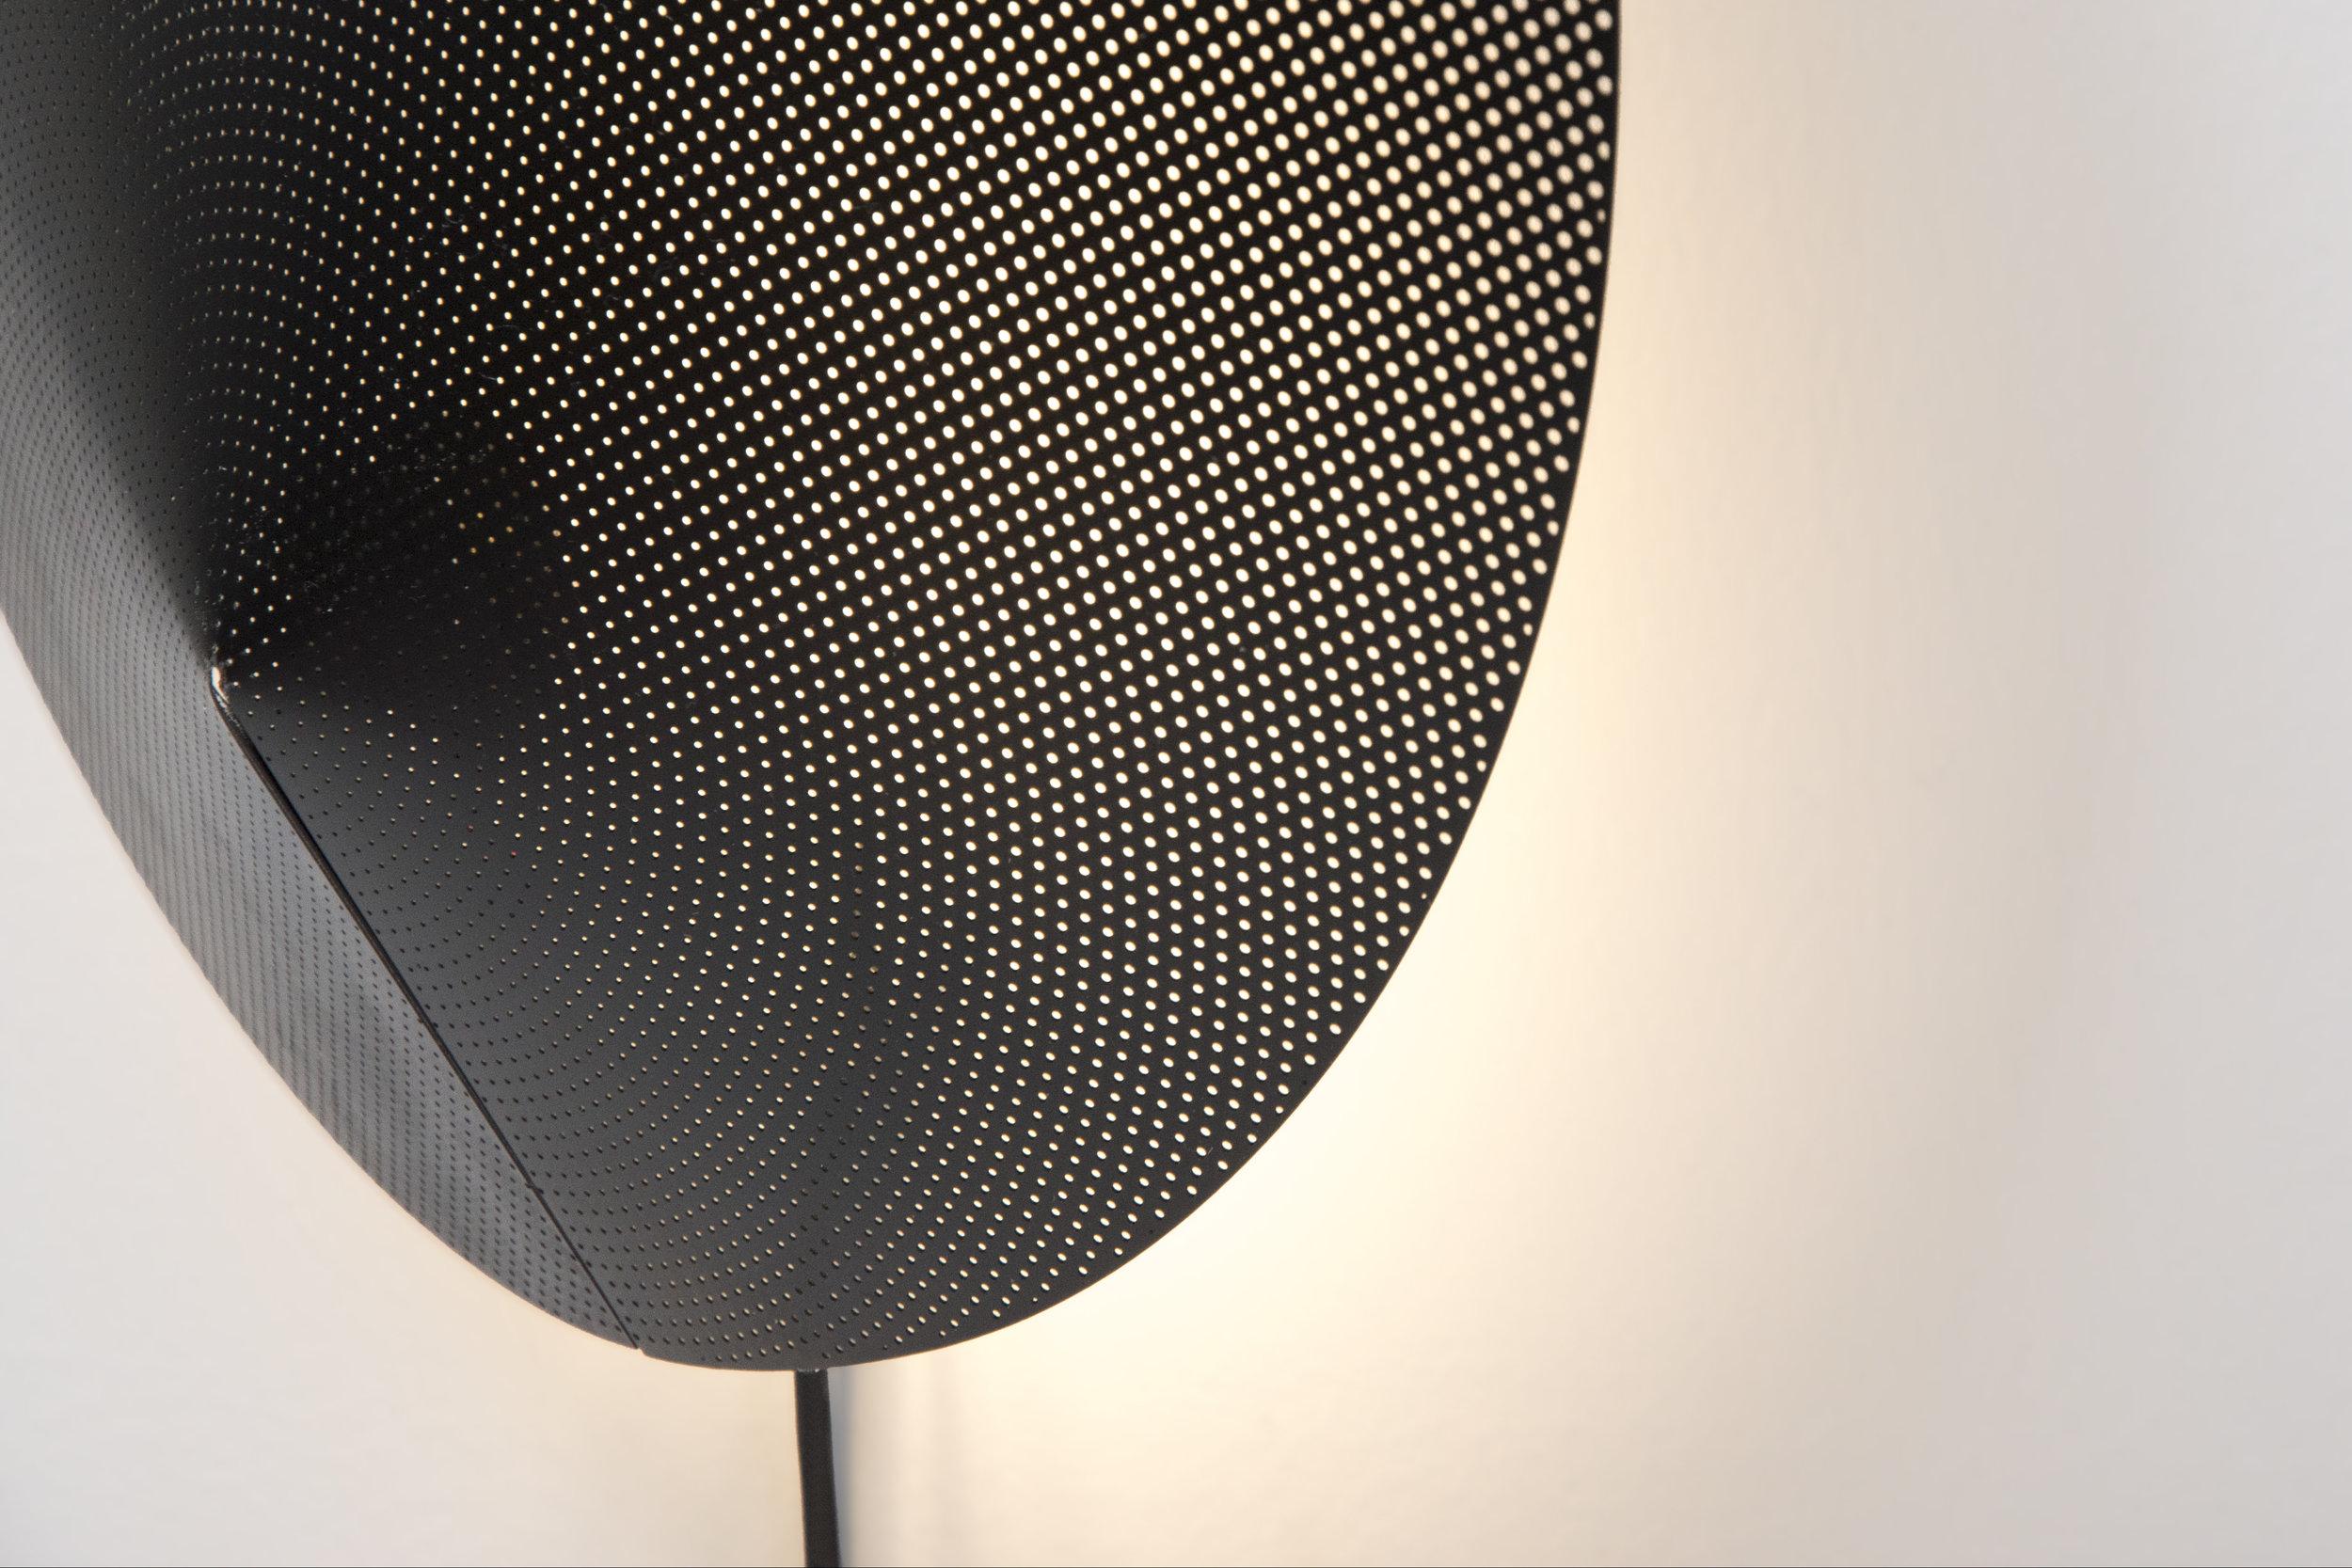 Lucid Wall Light - detail - David Derksen Design.jpg